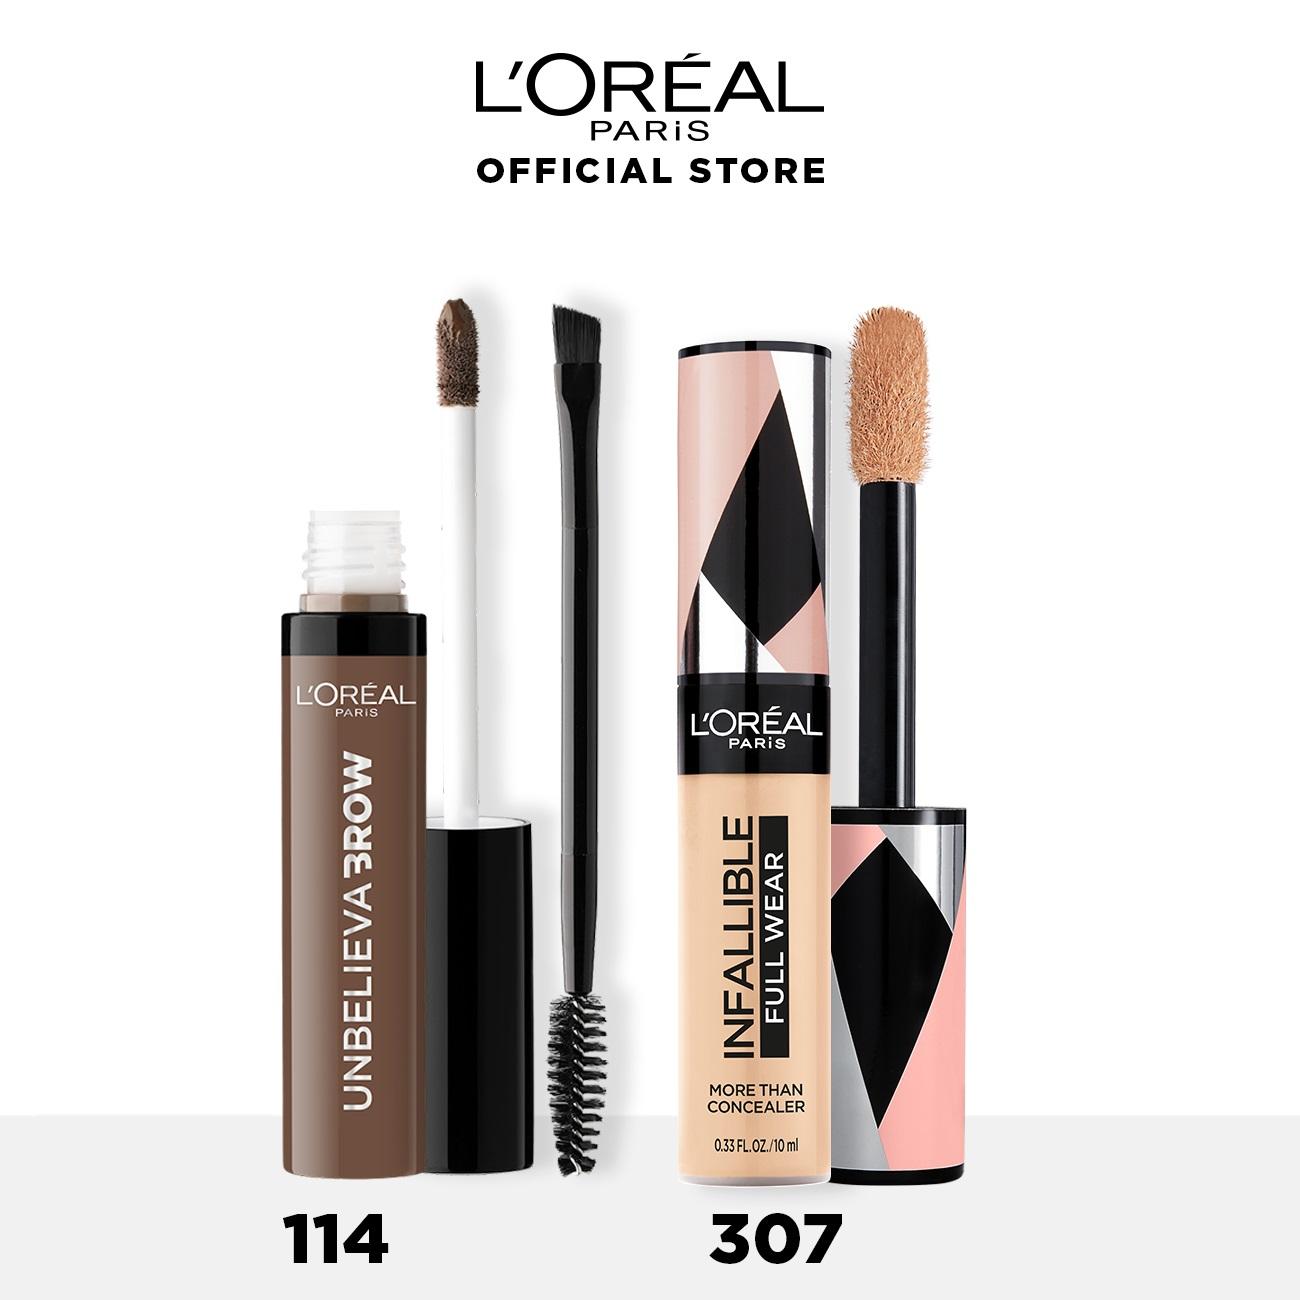 L Oreal Paris Unbelievabrow Brow Gel + More Than Concealer Makeup - 114 Light + 307 thumbnail